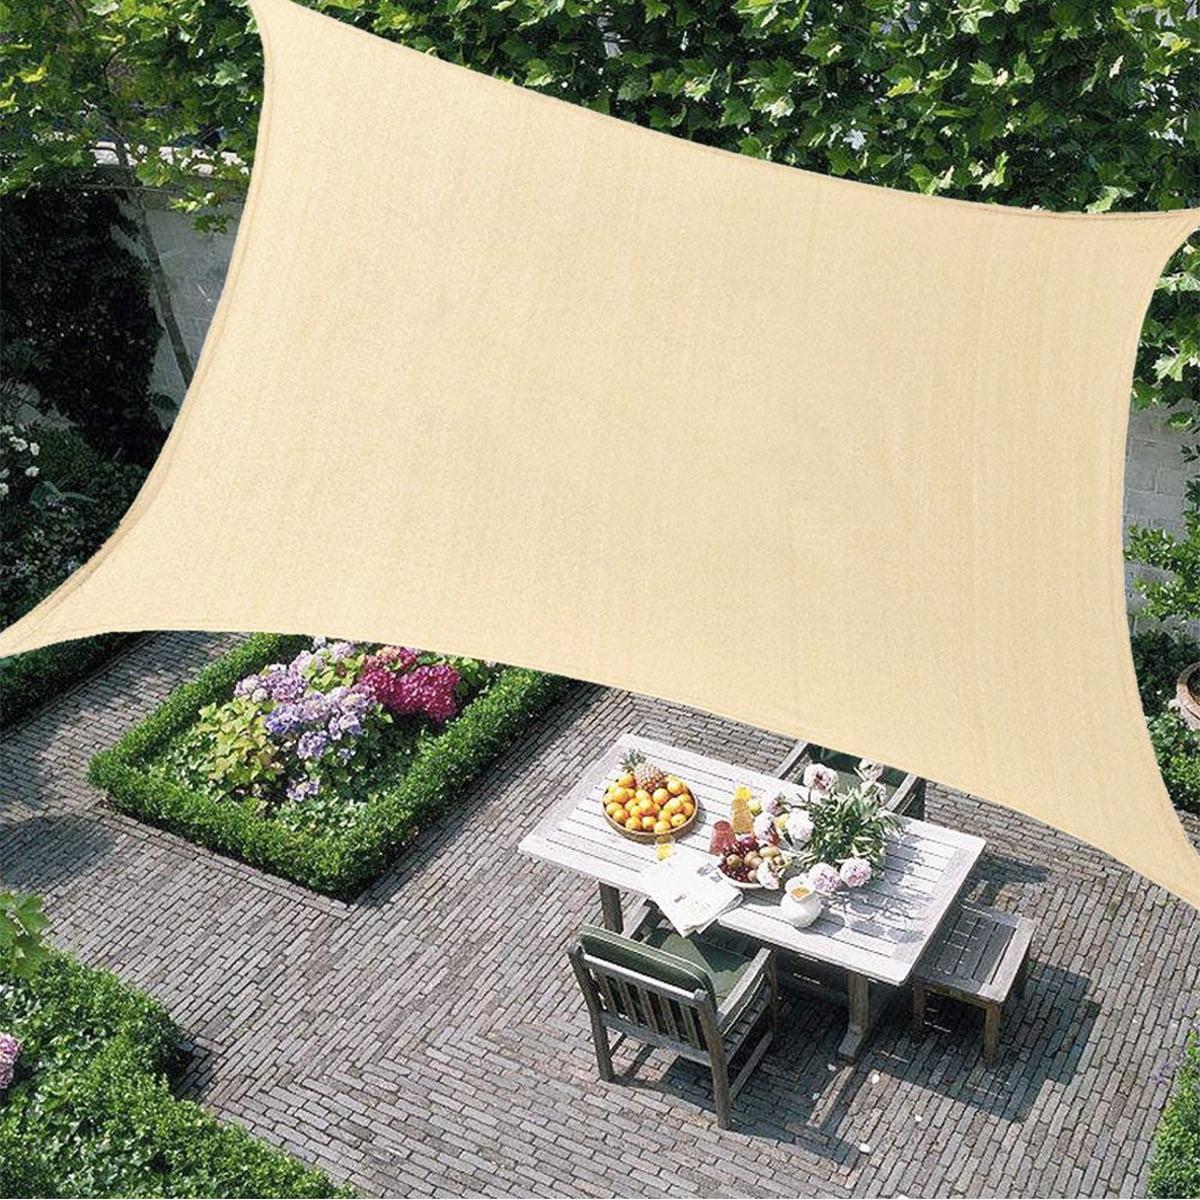 8 X 10 Sun Shade Sails Canopy Rectangle Heavy Duty Sunshade Fabric Awning Shelter 95 Uv Blockage For Patio Outdoor Garden Light Beige Walmart Com Walmart Com